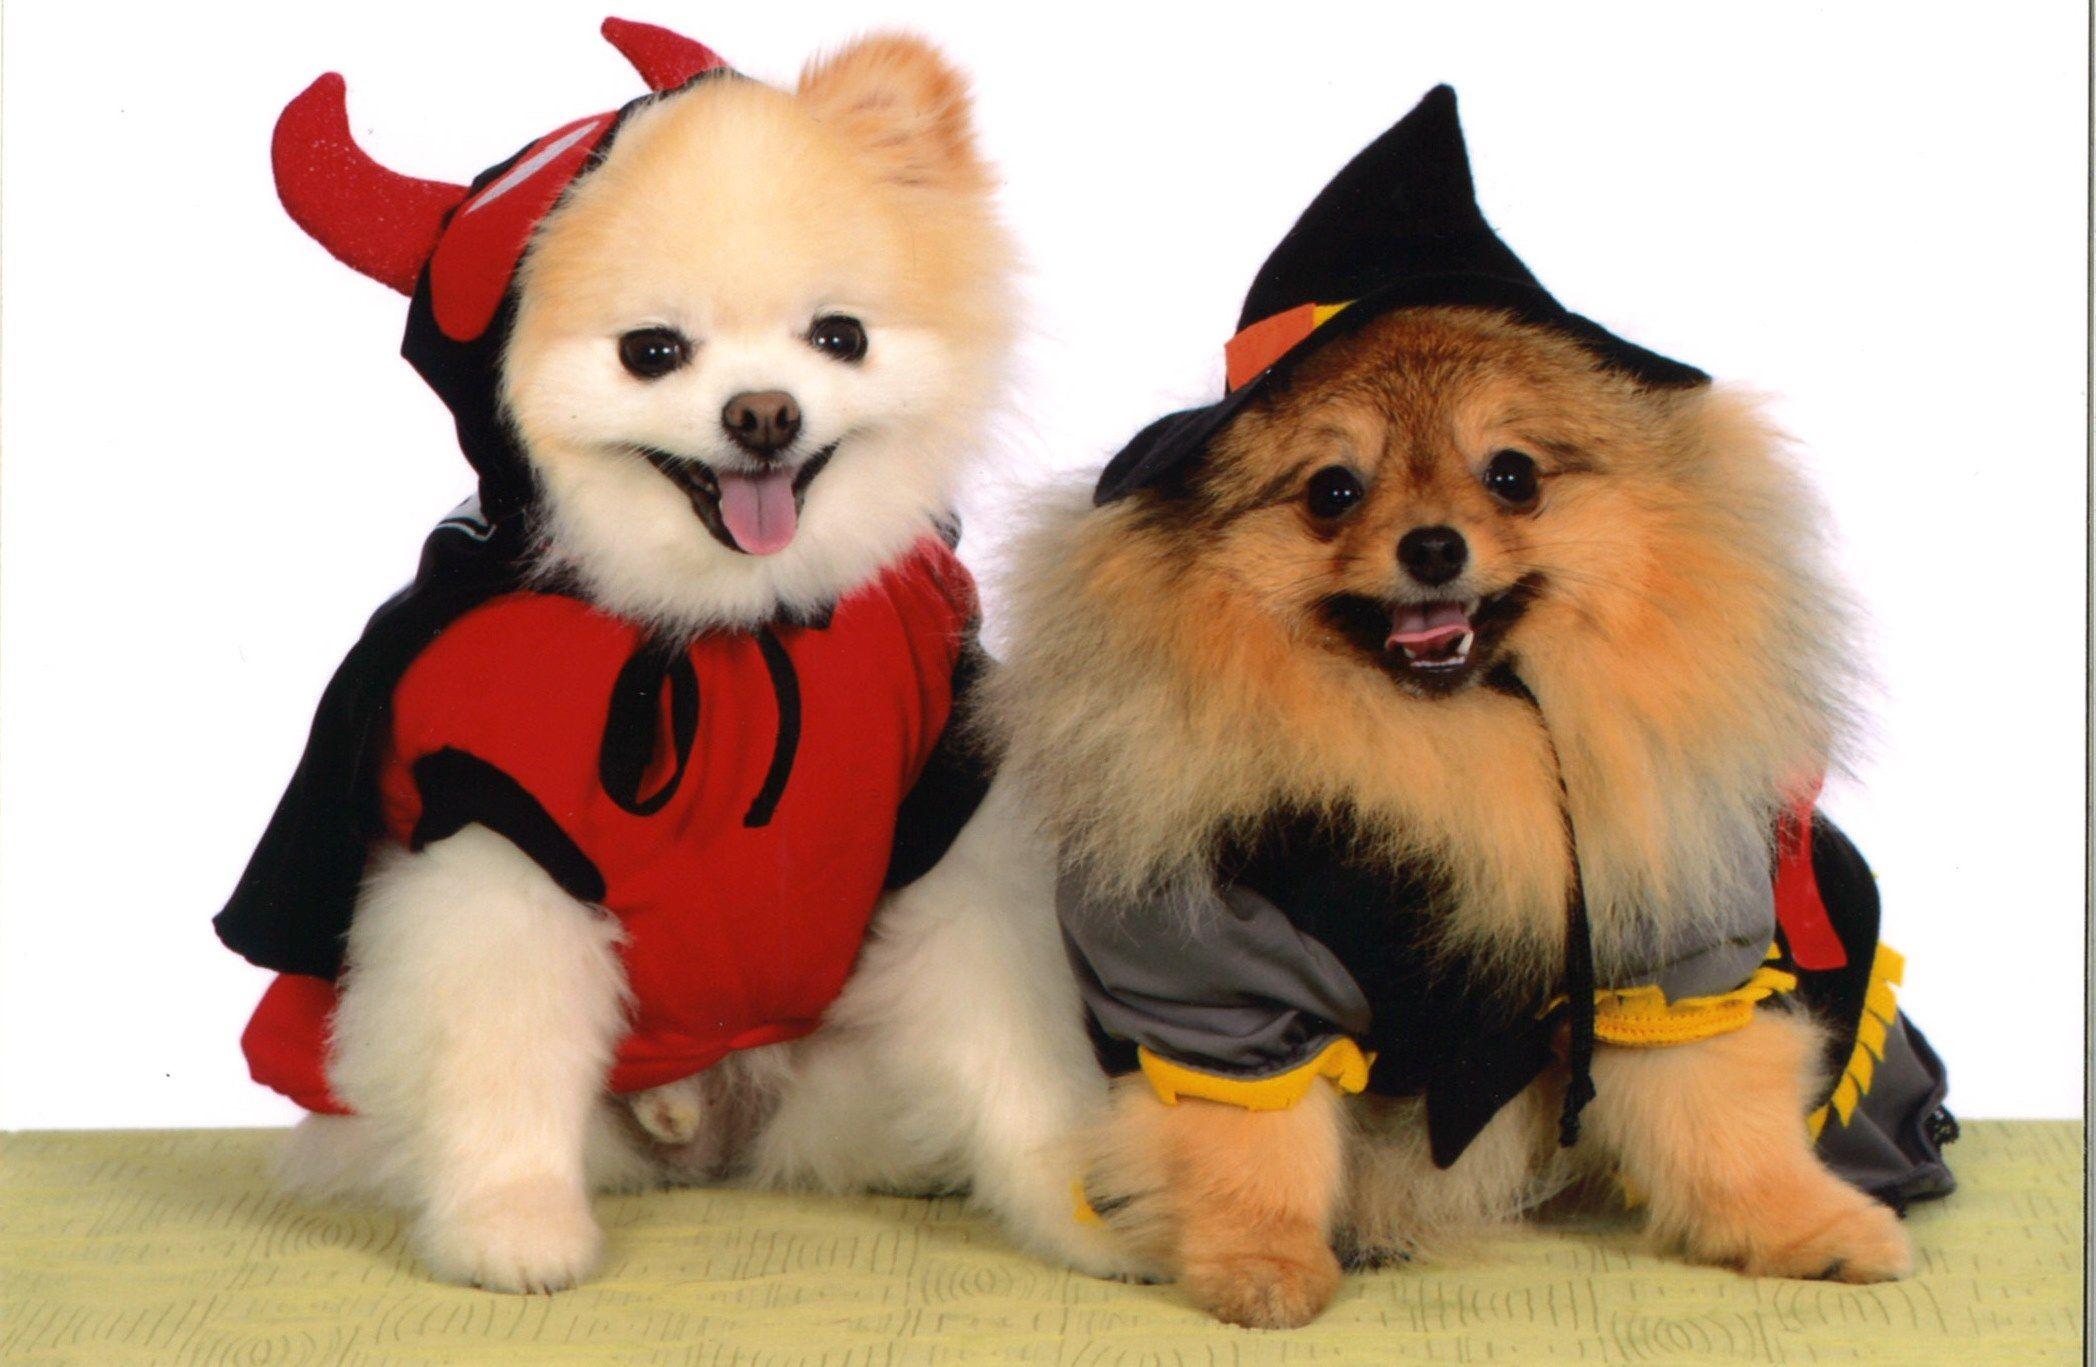 pomeranian, poms, dogs, puppies, halloween | pomeranians | pinterest